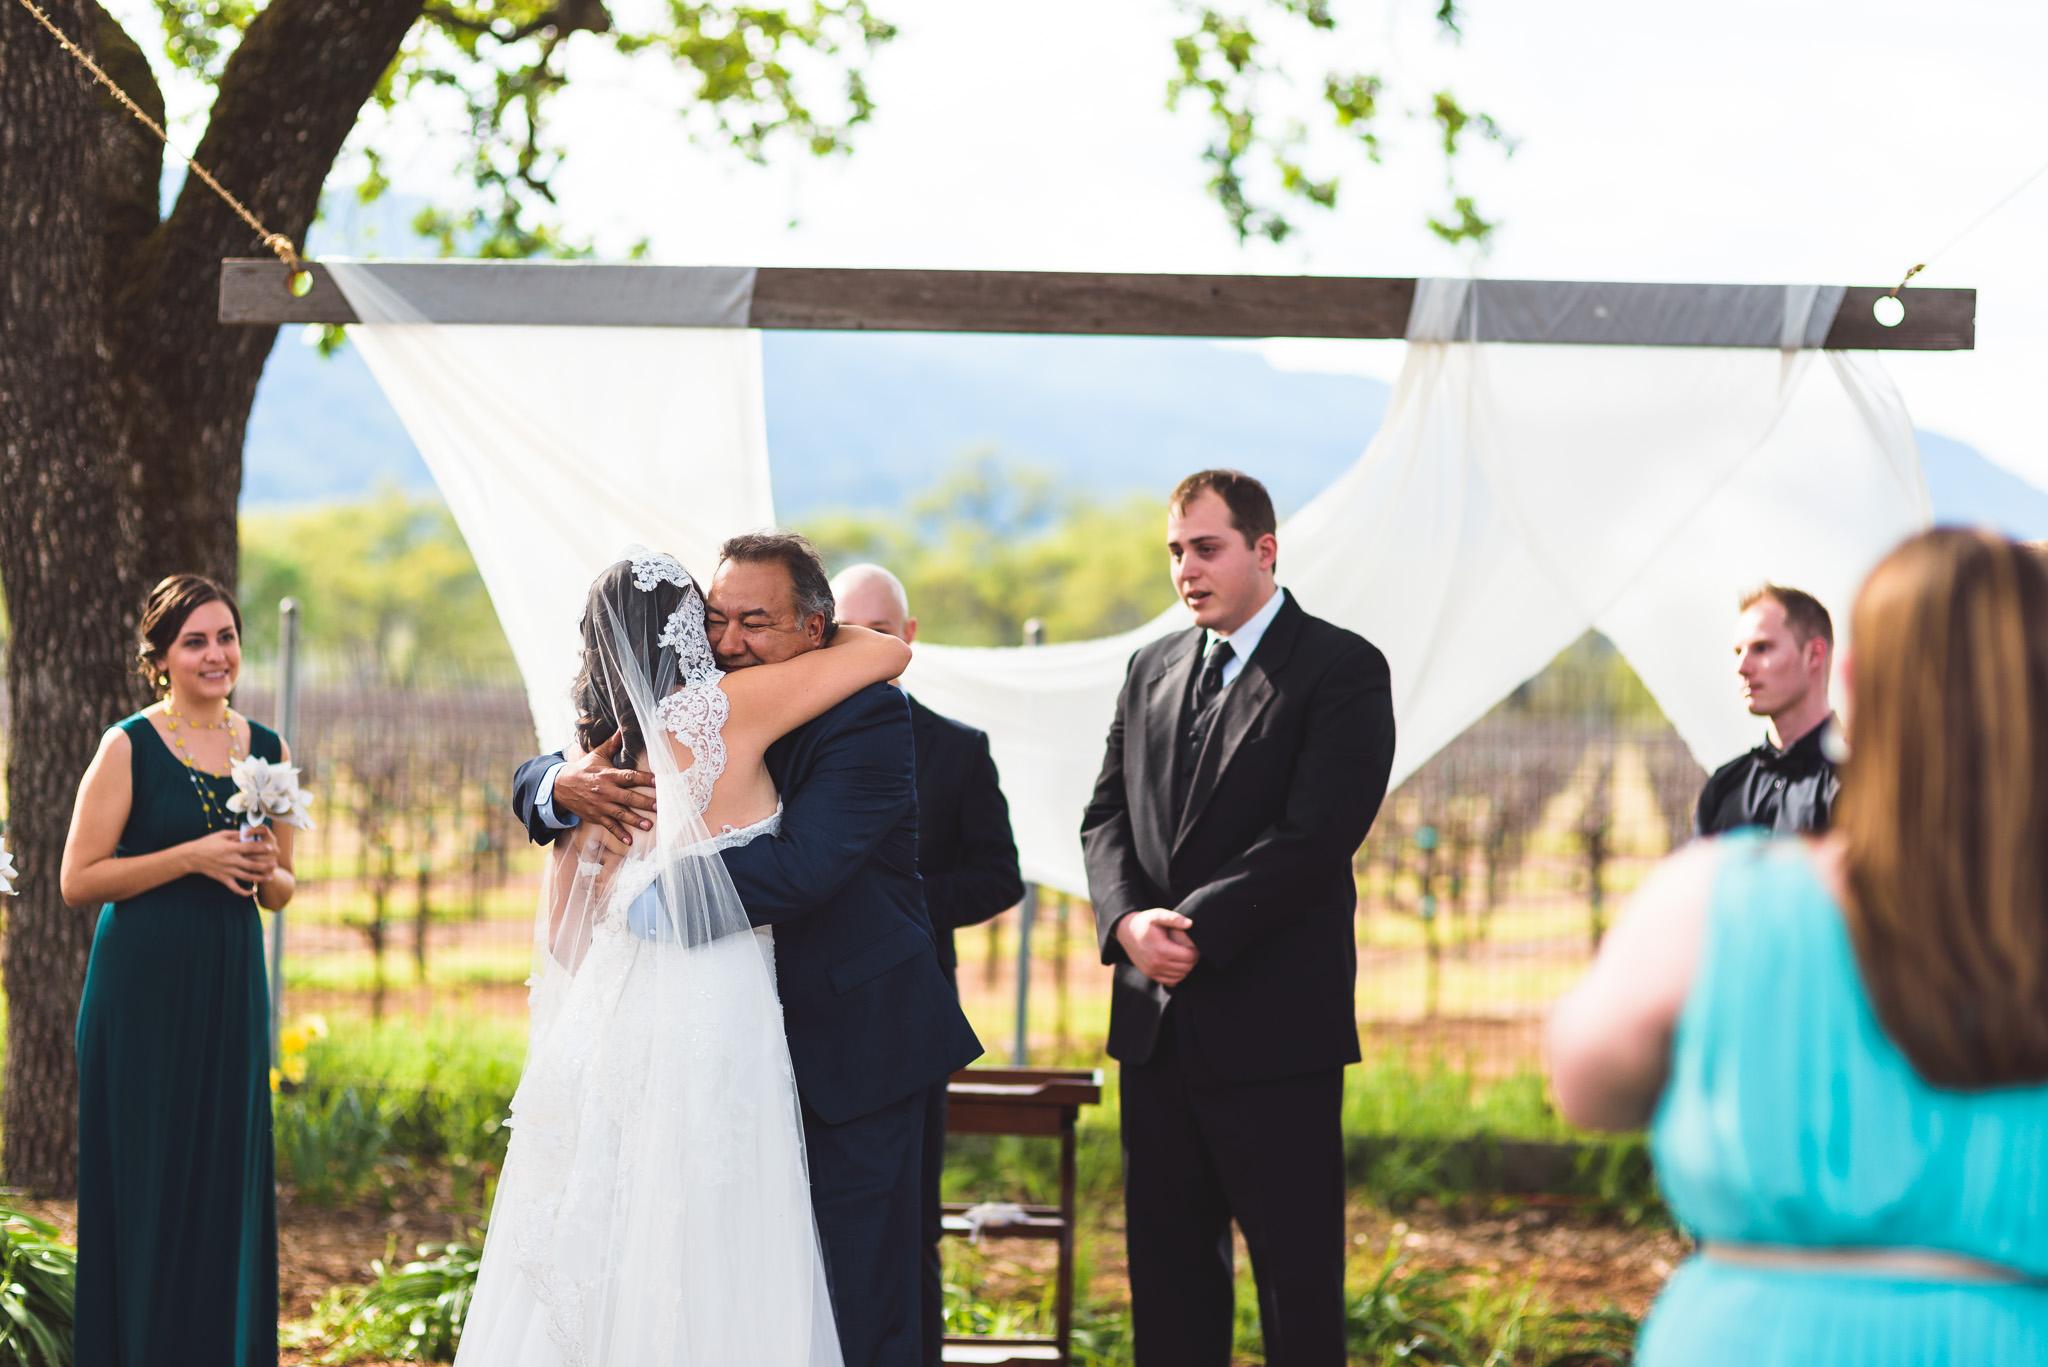 Sonoma_Backyard_Wedding-Chuck_Caroline-032.jpg